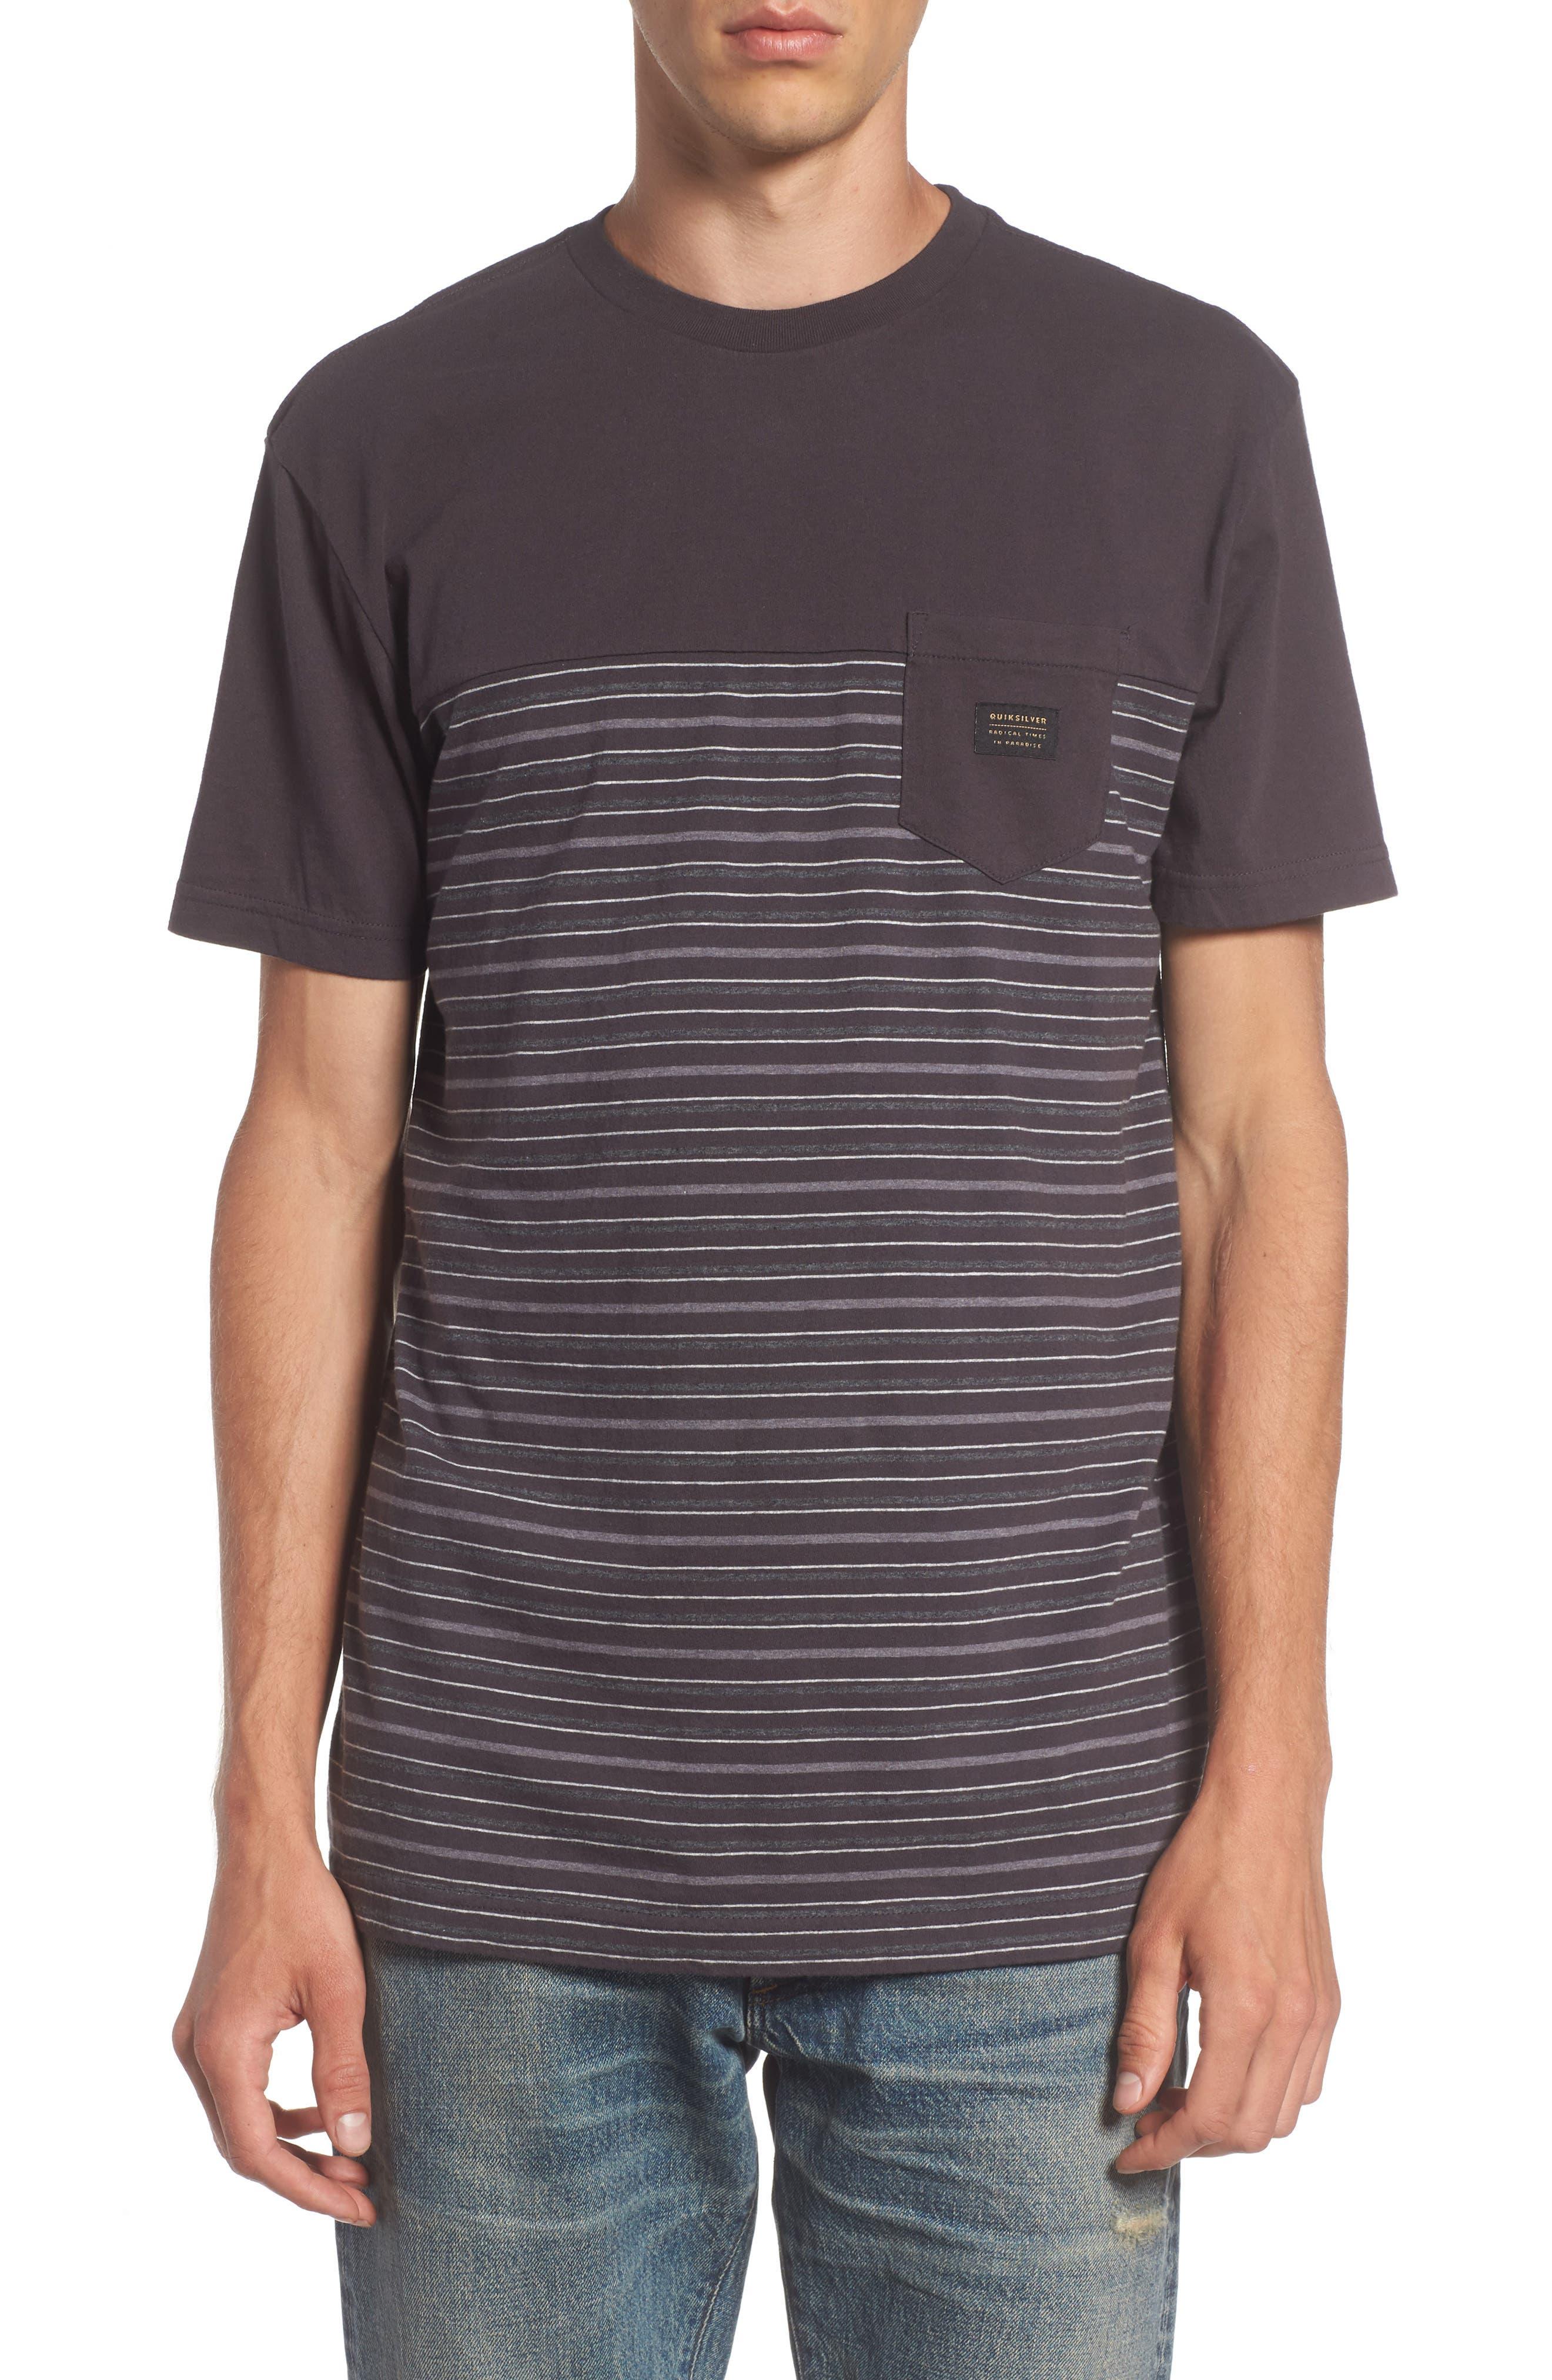 Alternate Image 1 Selected - Quiksilver Full Tide T-Shirt